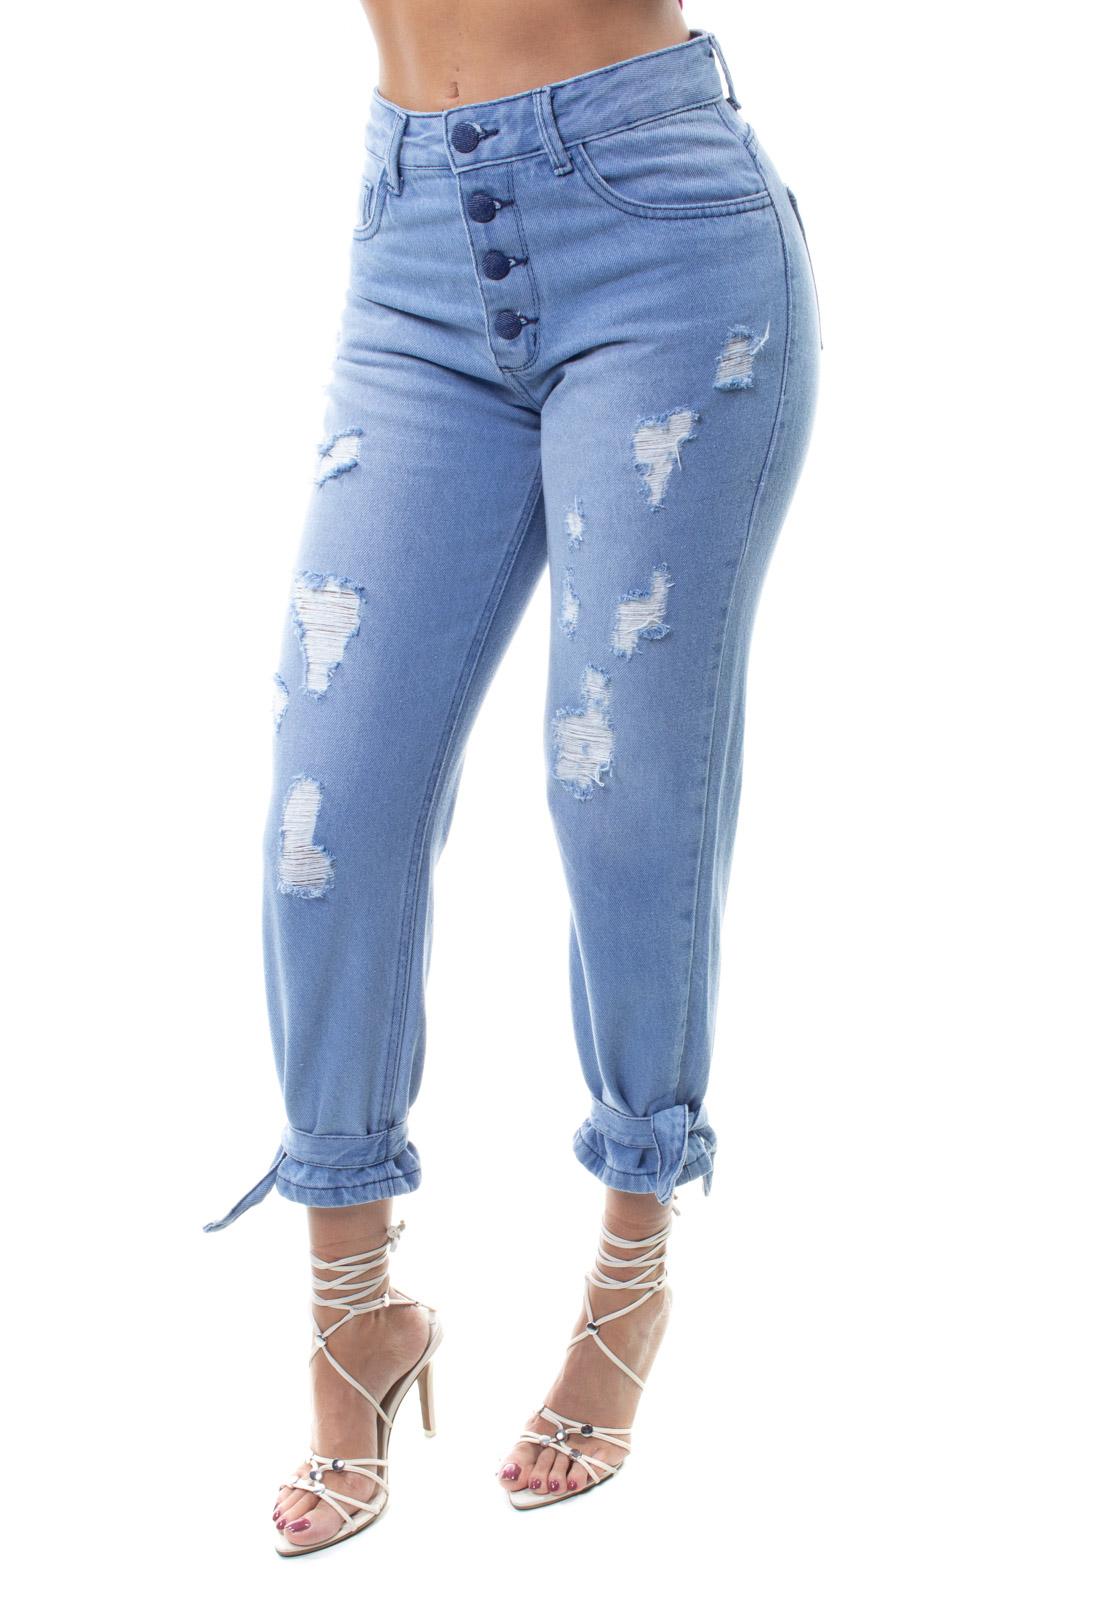 Calça  Jeans Feminina Mom Fit Crocker - 48173  - CROCKER JEANS